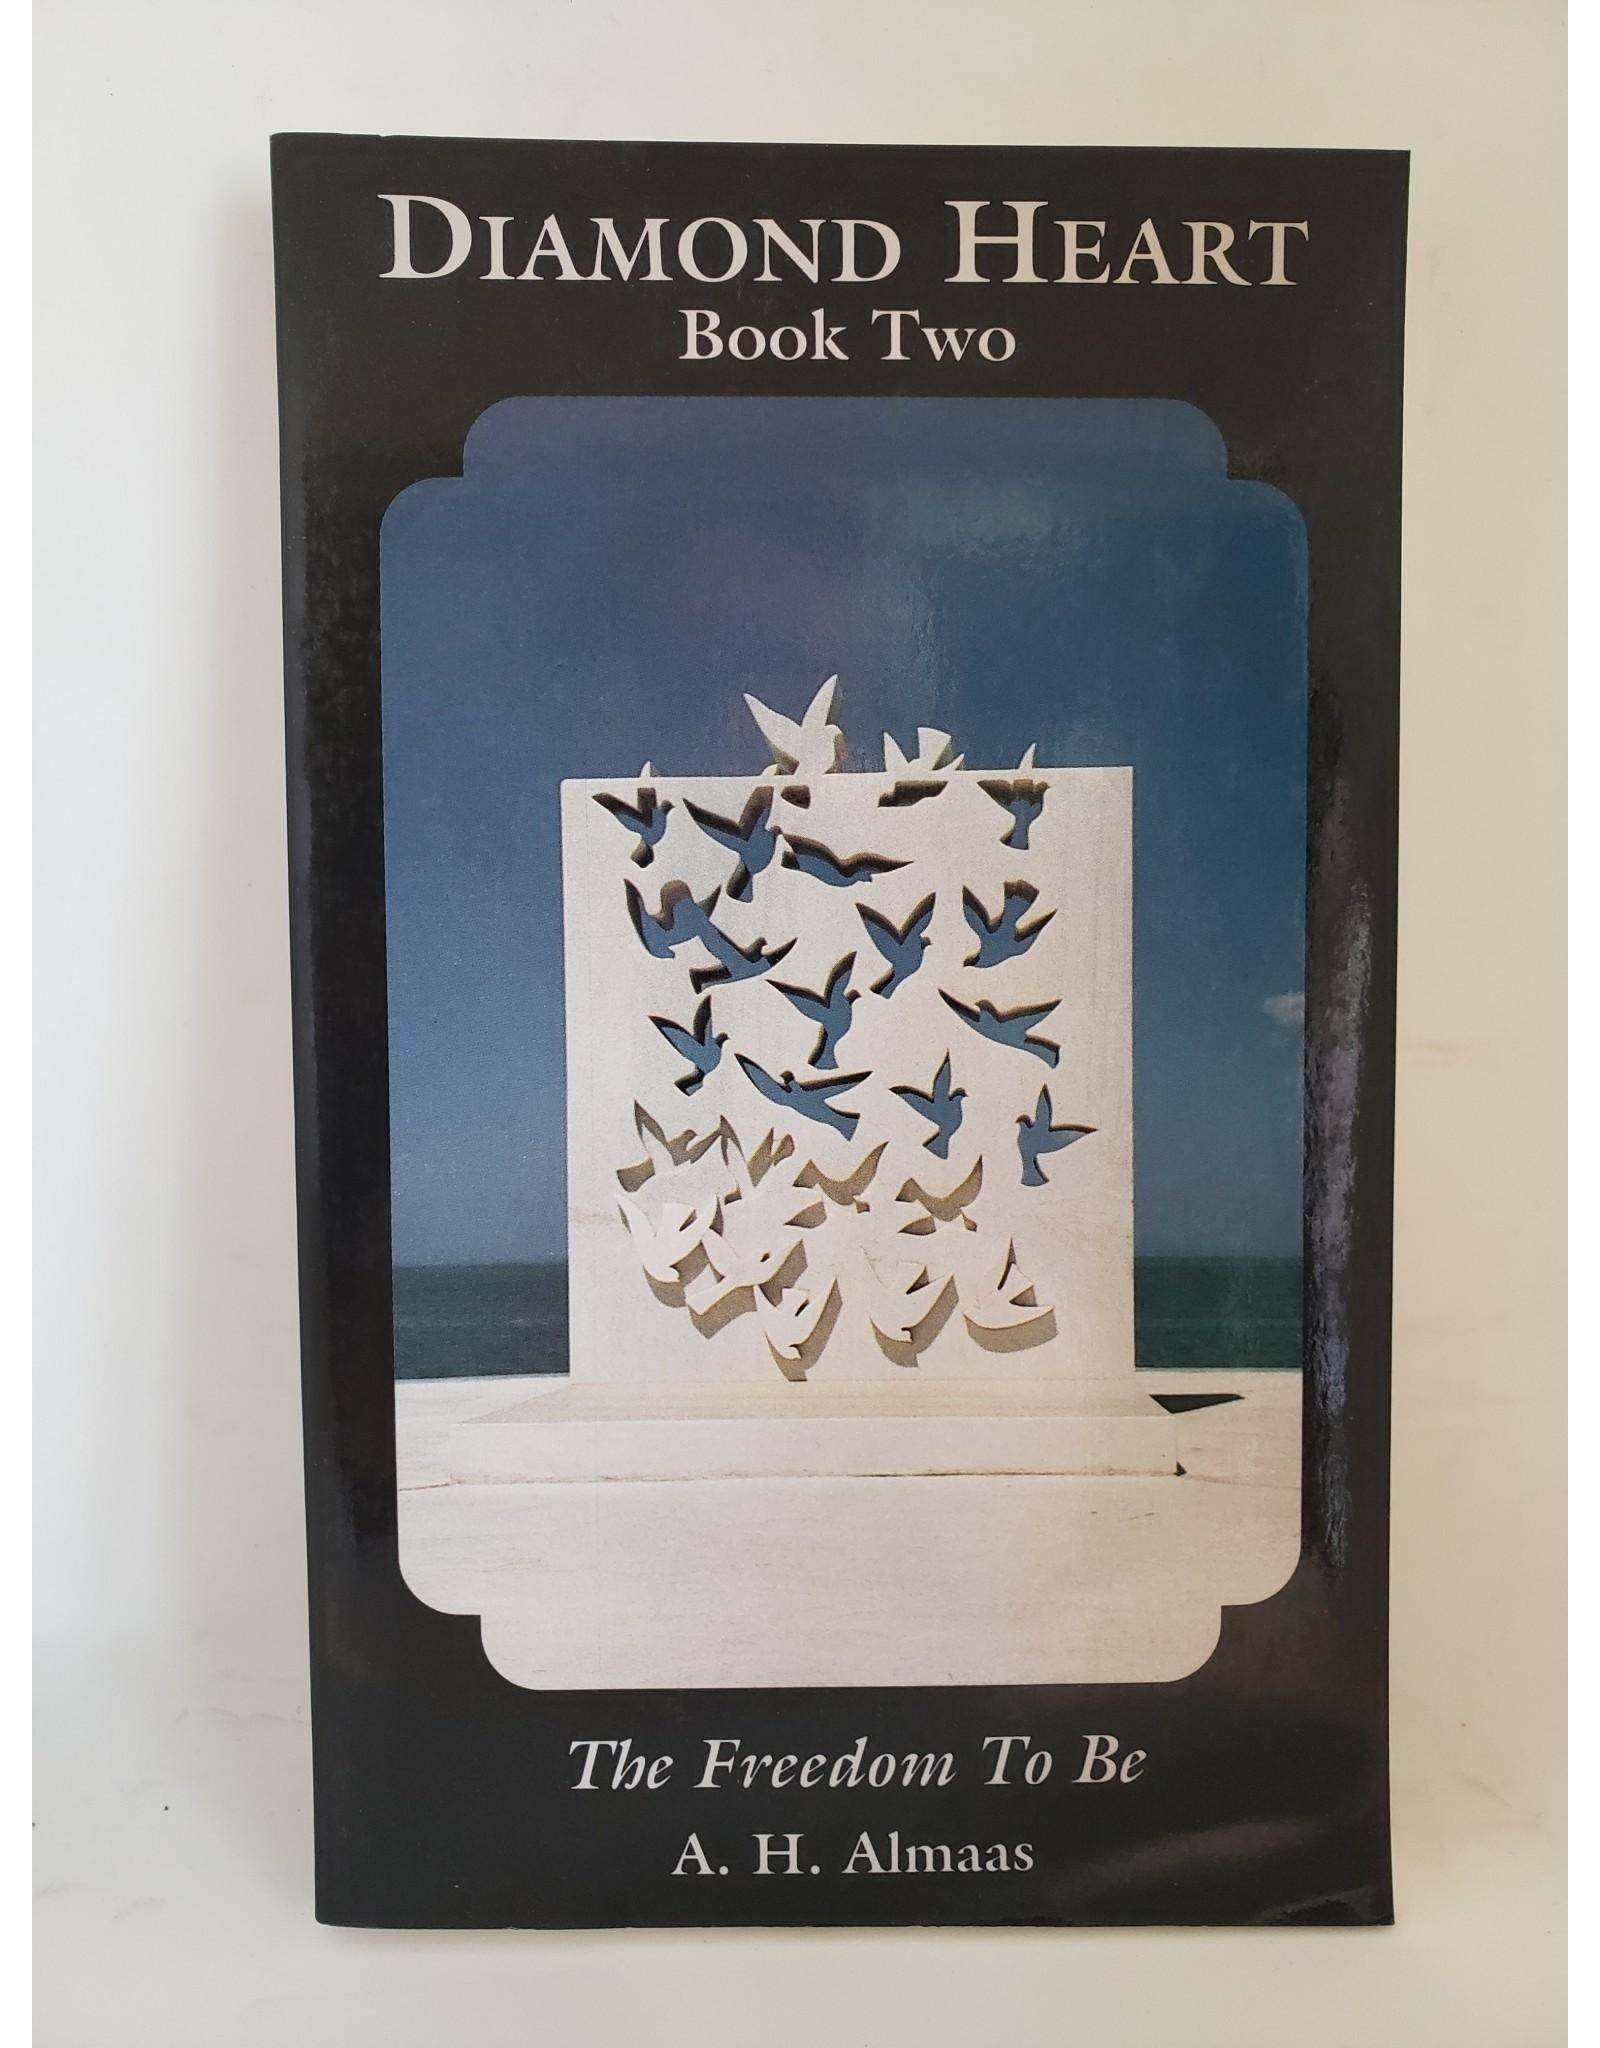 Diamond Heart Book Two